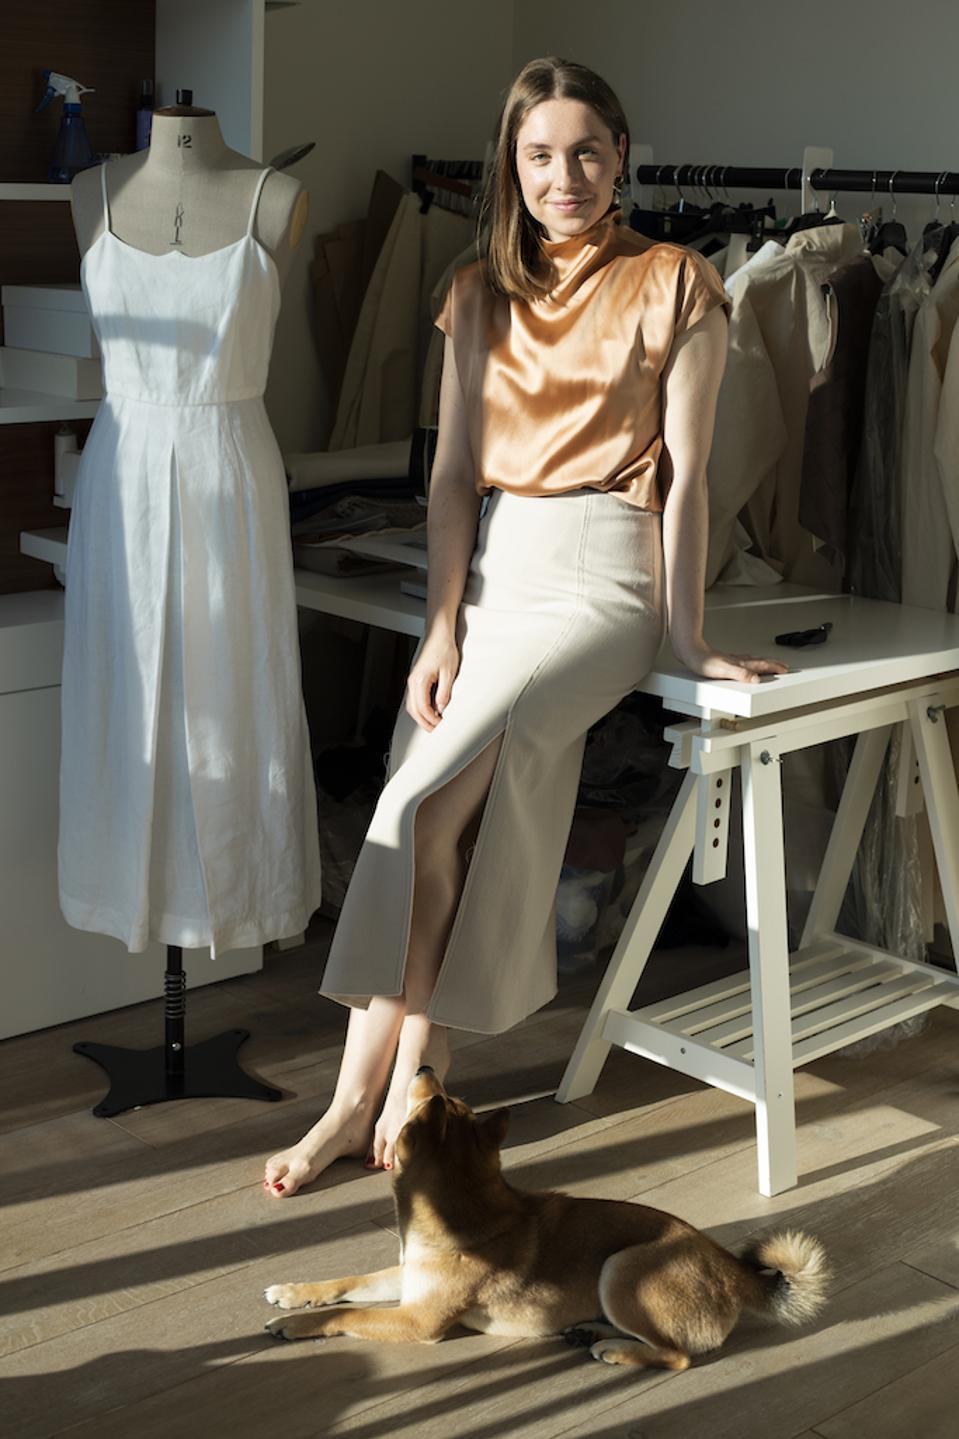 Emerging designer Hanna Fielder